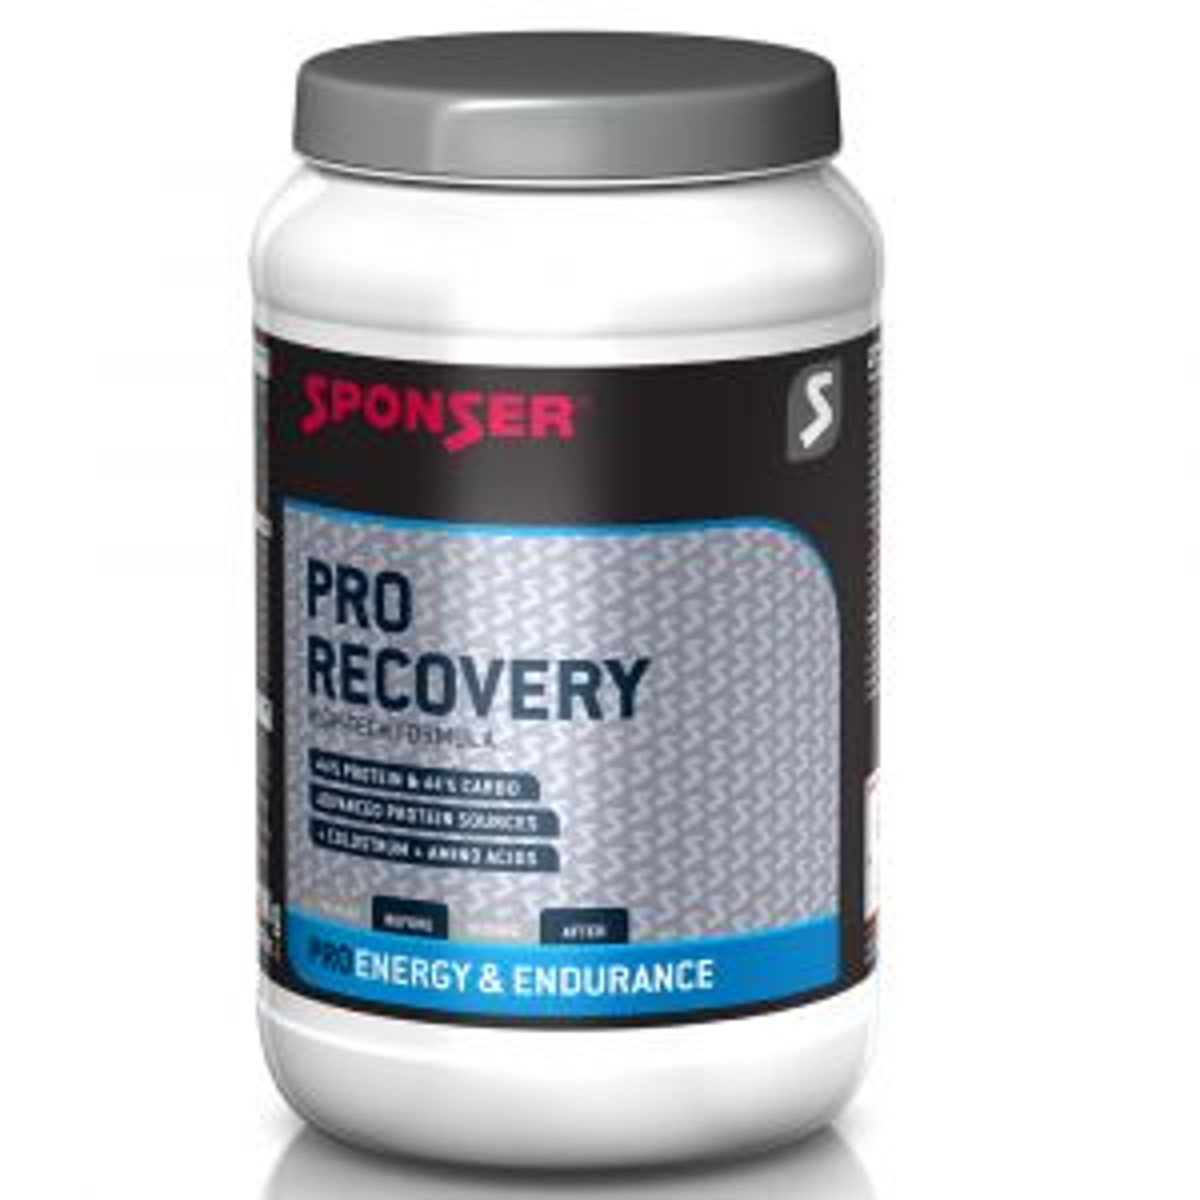 44/44 Pro Recovery Regenerationsdrink 800g Mango - Mindesthaltbarkeitsdatum 11/2022